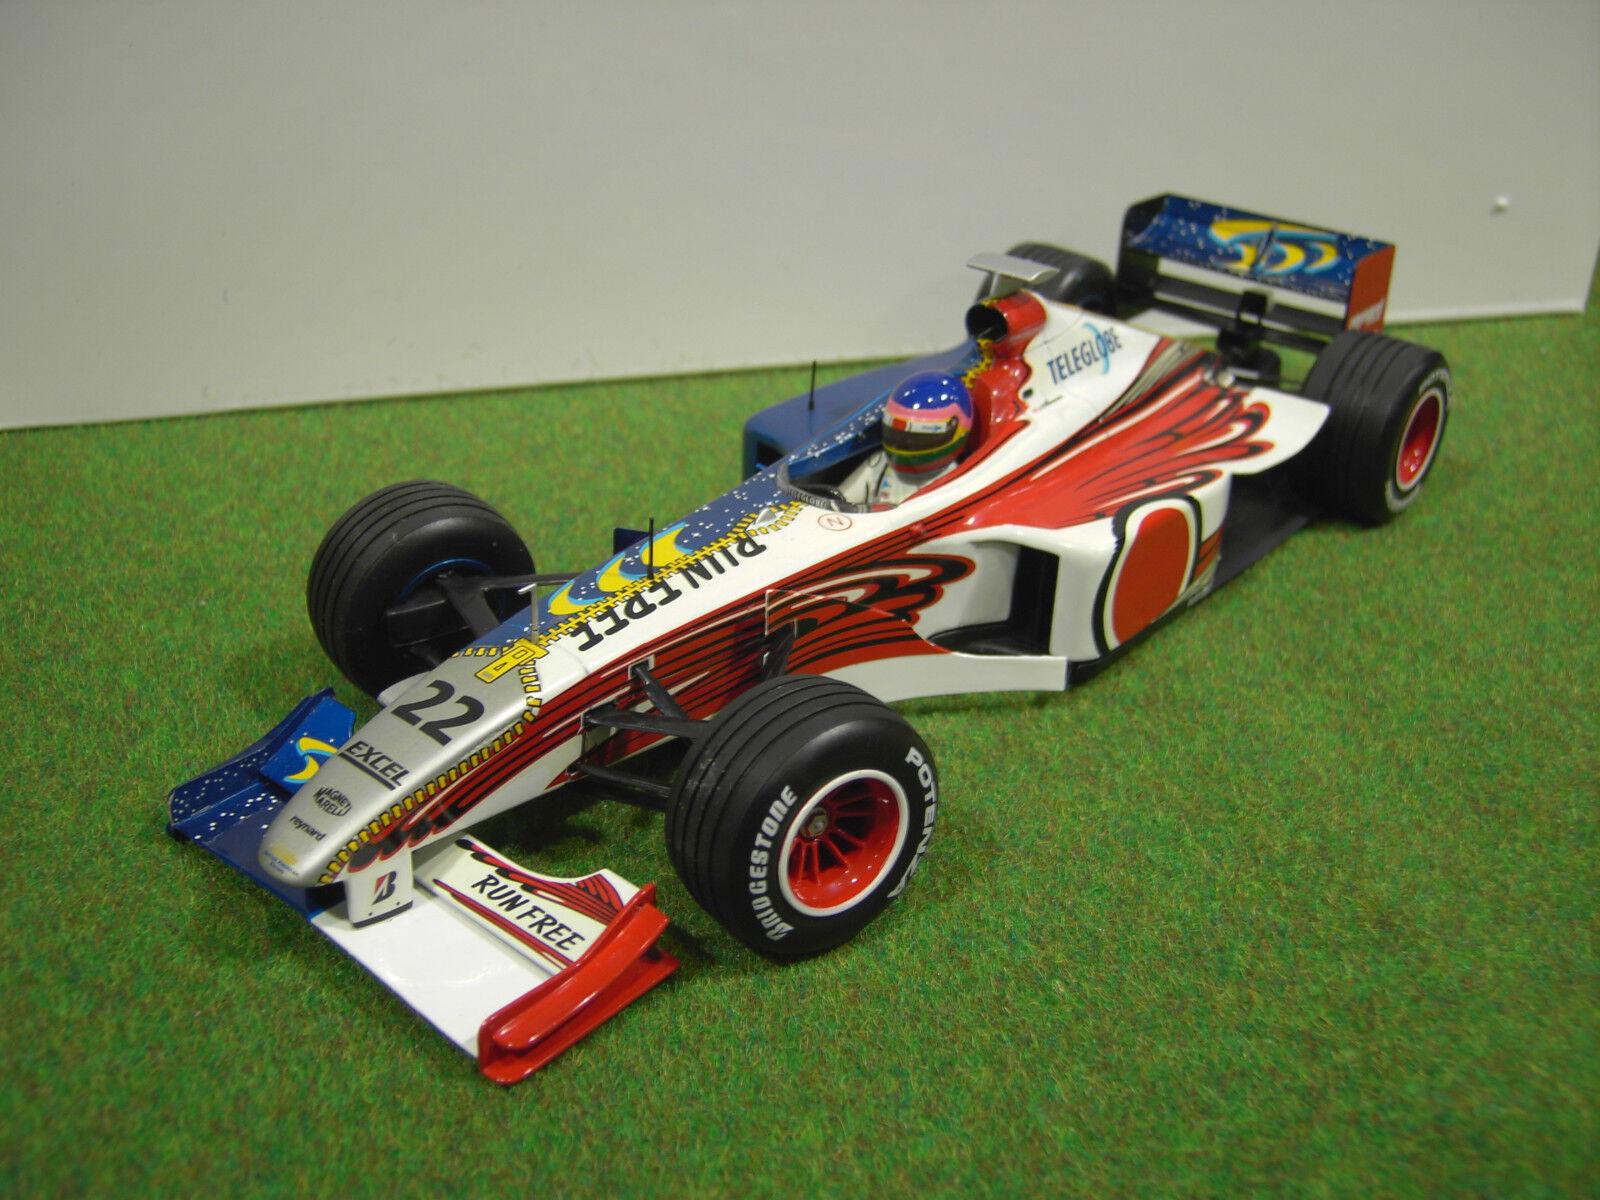 presa di marca F1 F1 F1 BAR 01 SUPERTEC 1999  22 Villeneuve 1 18 MINICHAMPS voiture miniatu formule 1  controlla il più economico